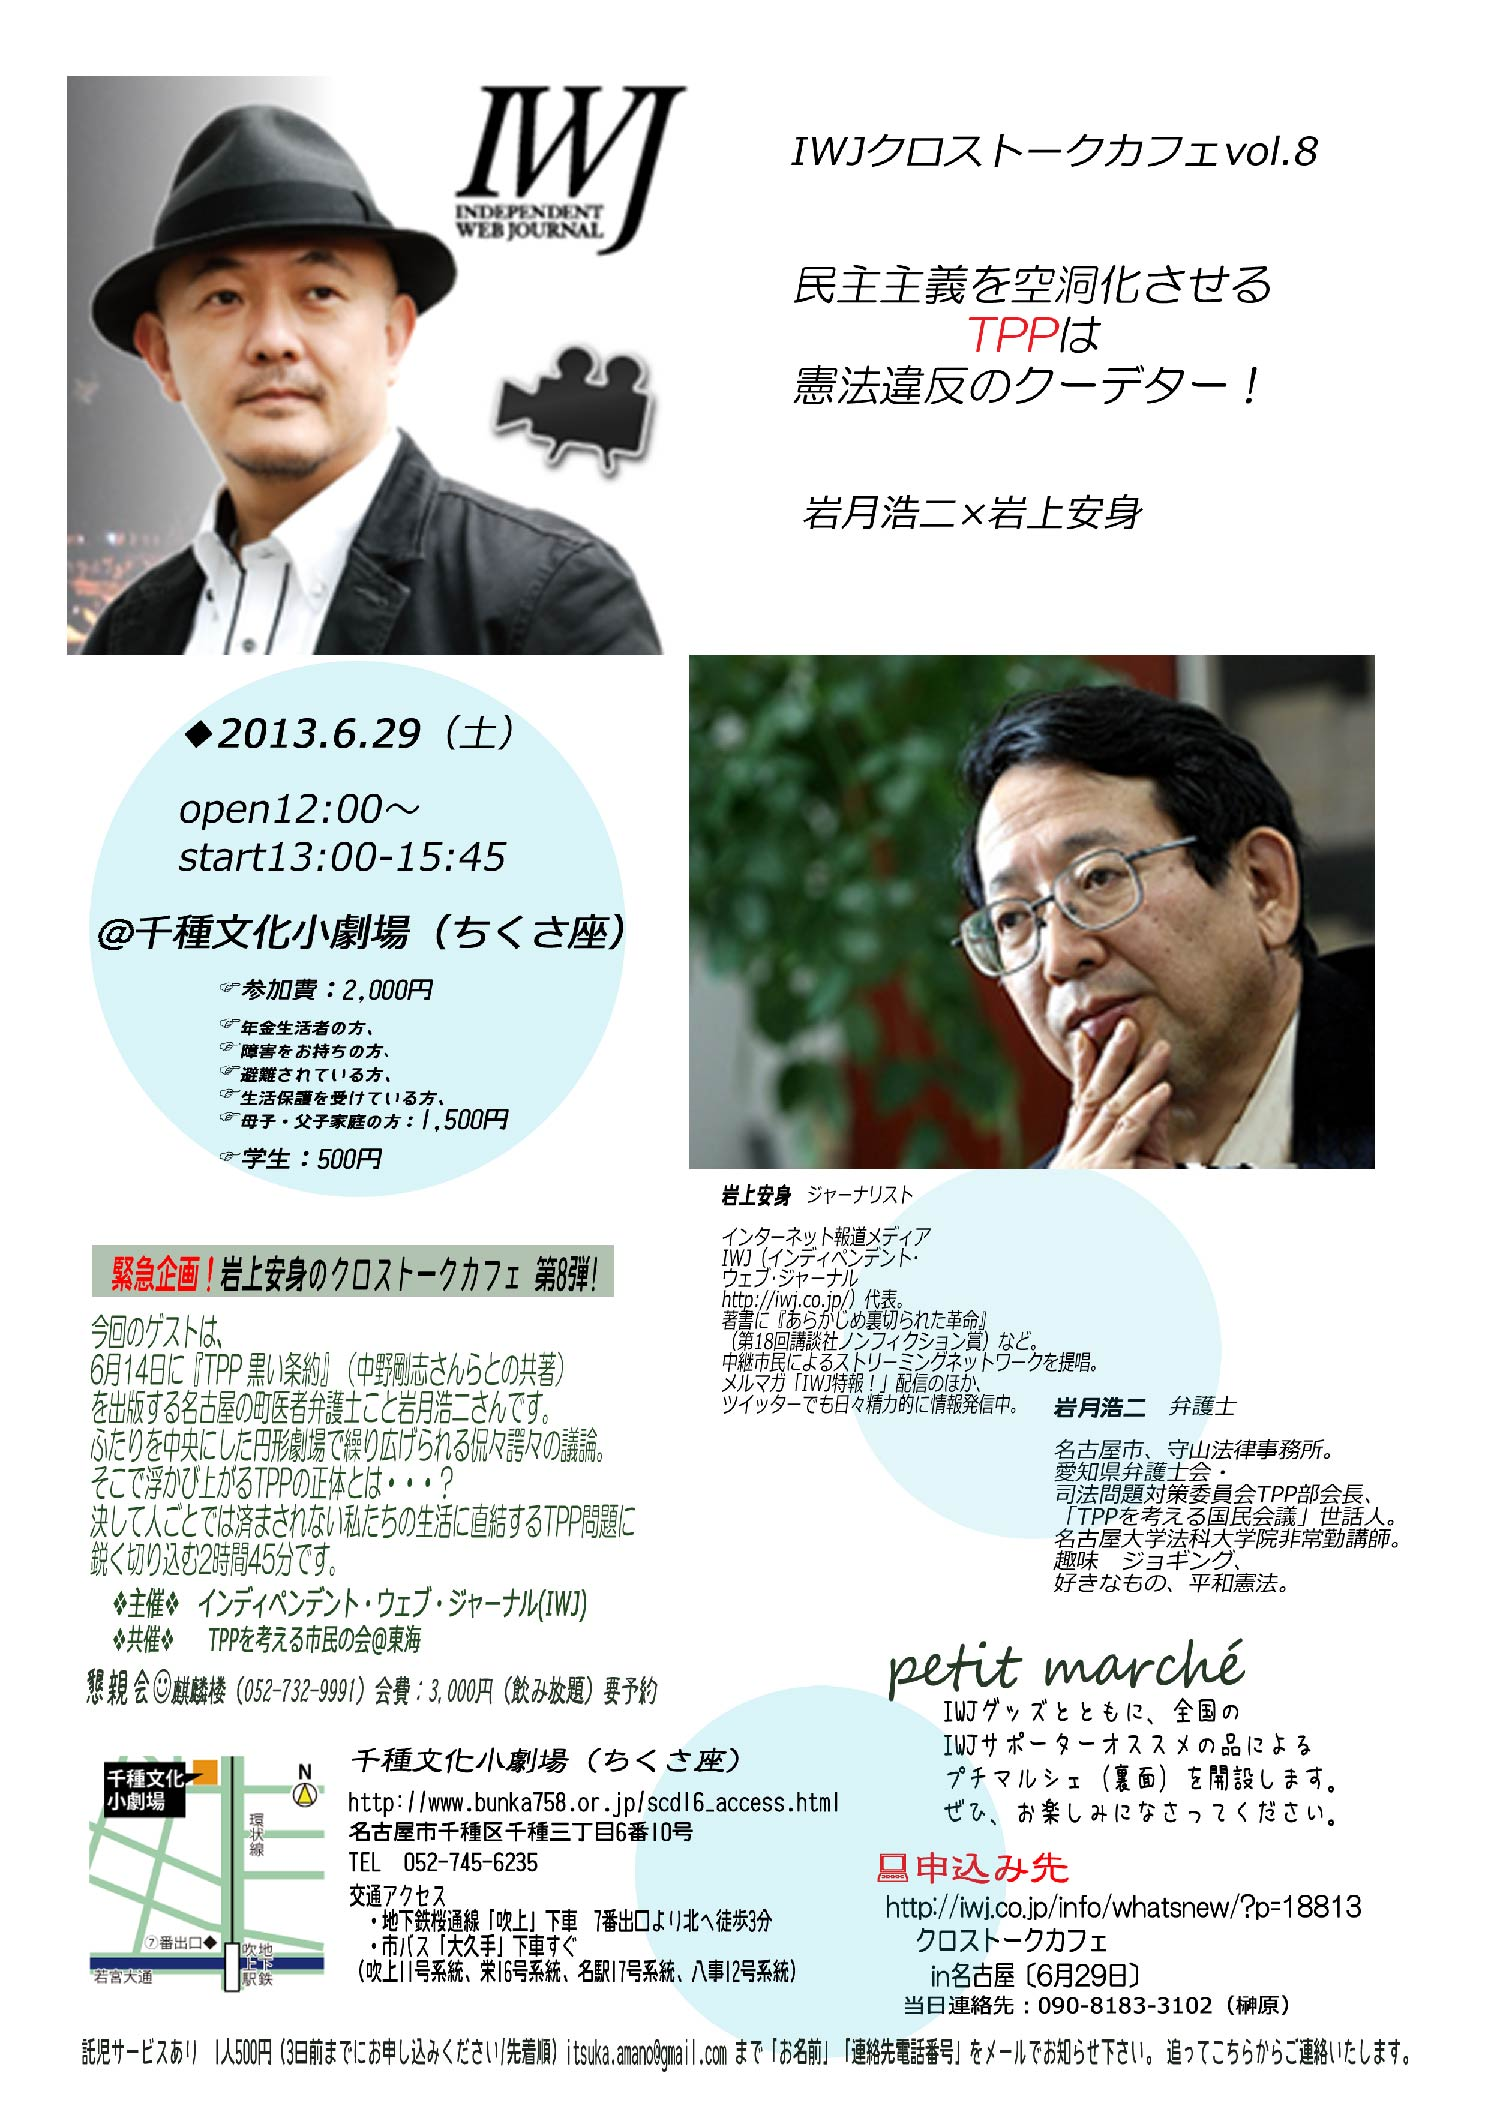 http://iwj.co.jp/info/whatsnew/wp-content/uploads/2013/06/iwjtalkcafe_606.jpg